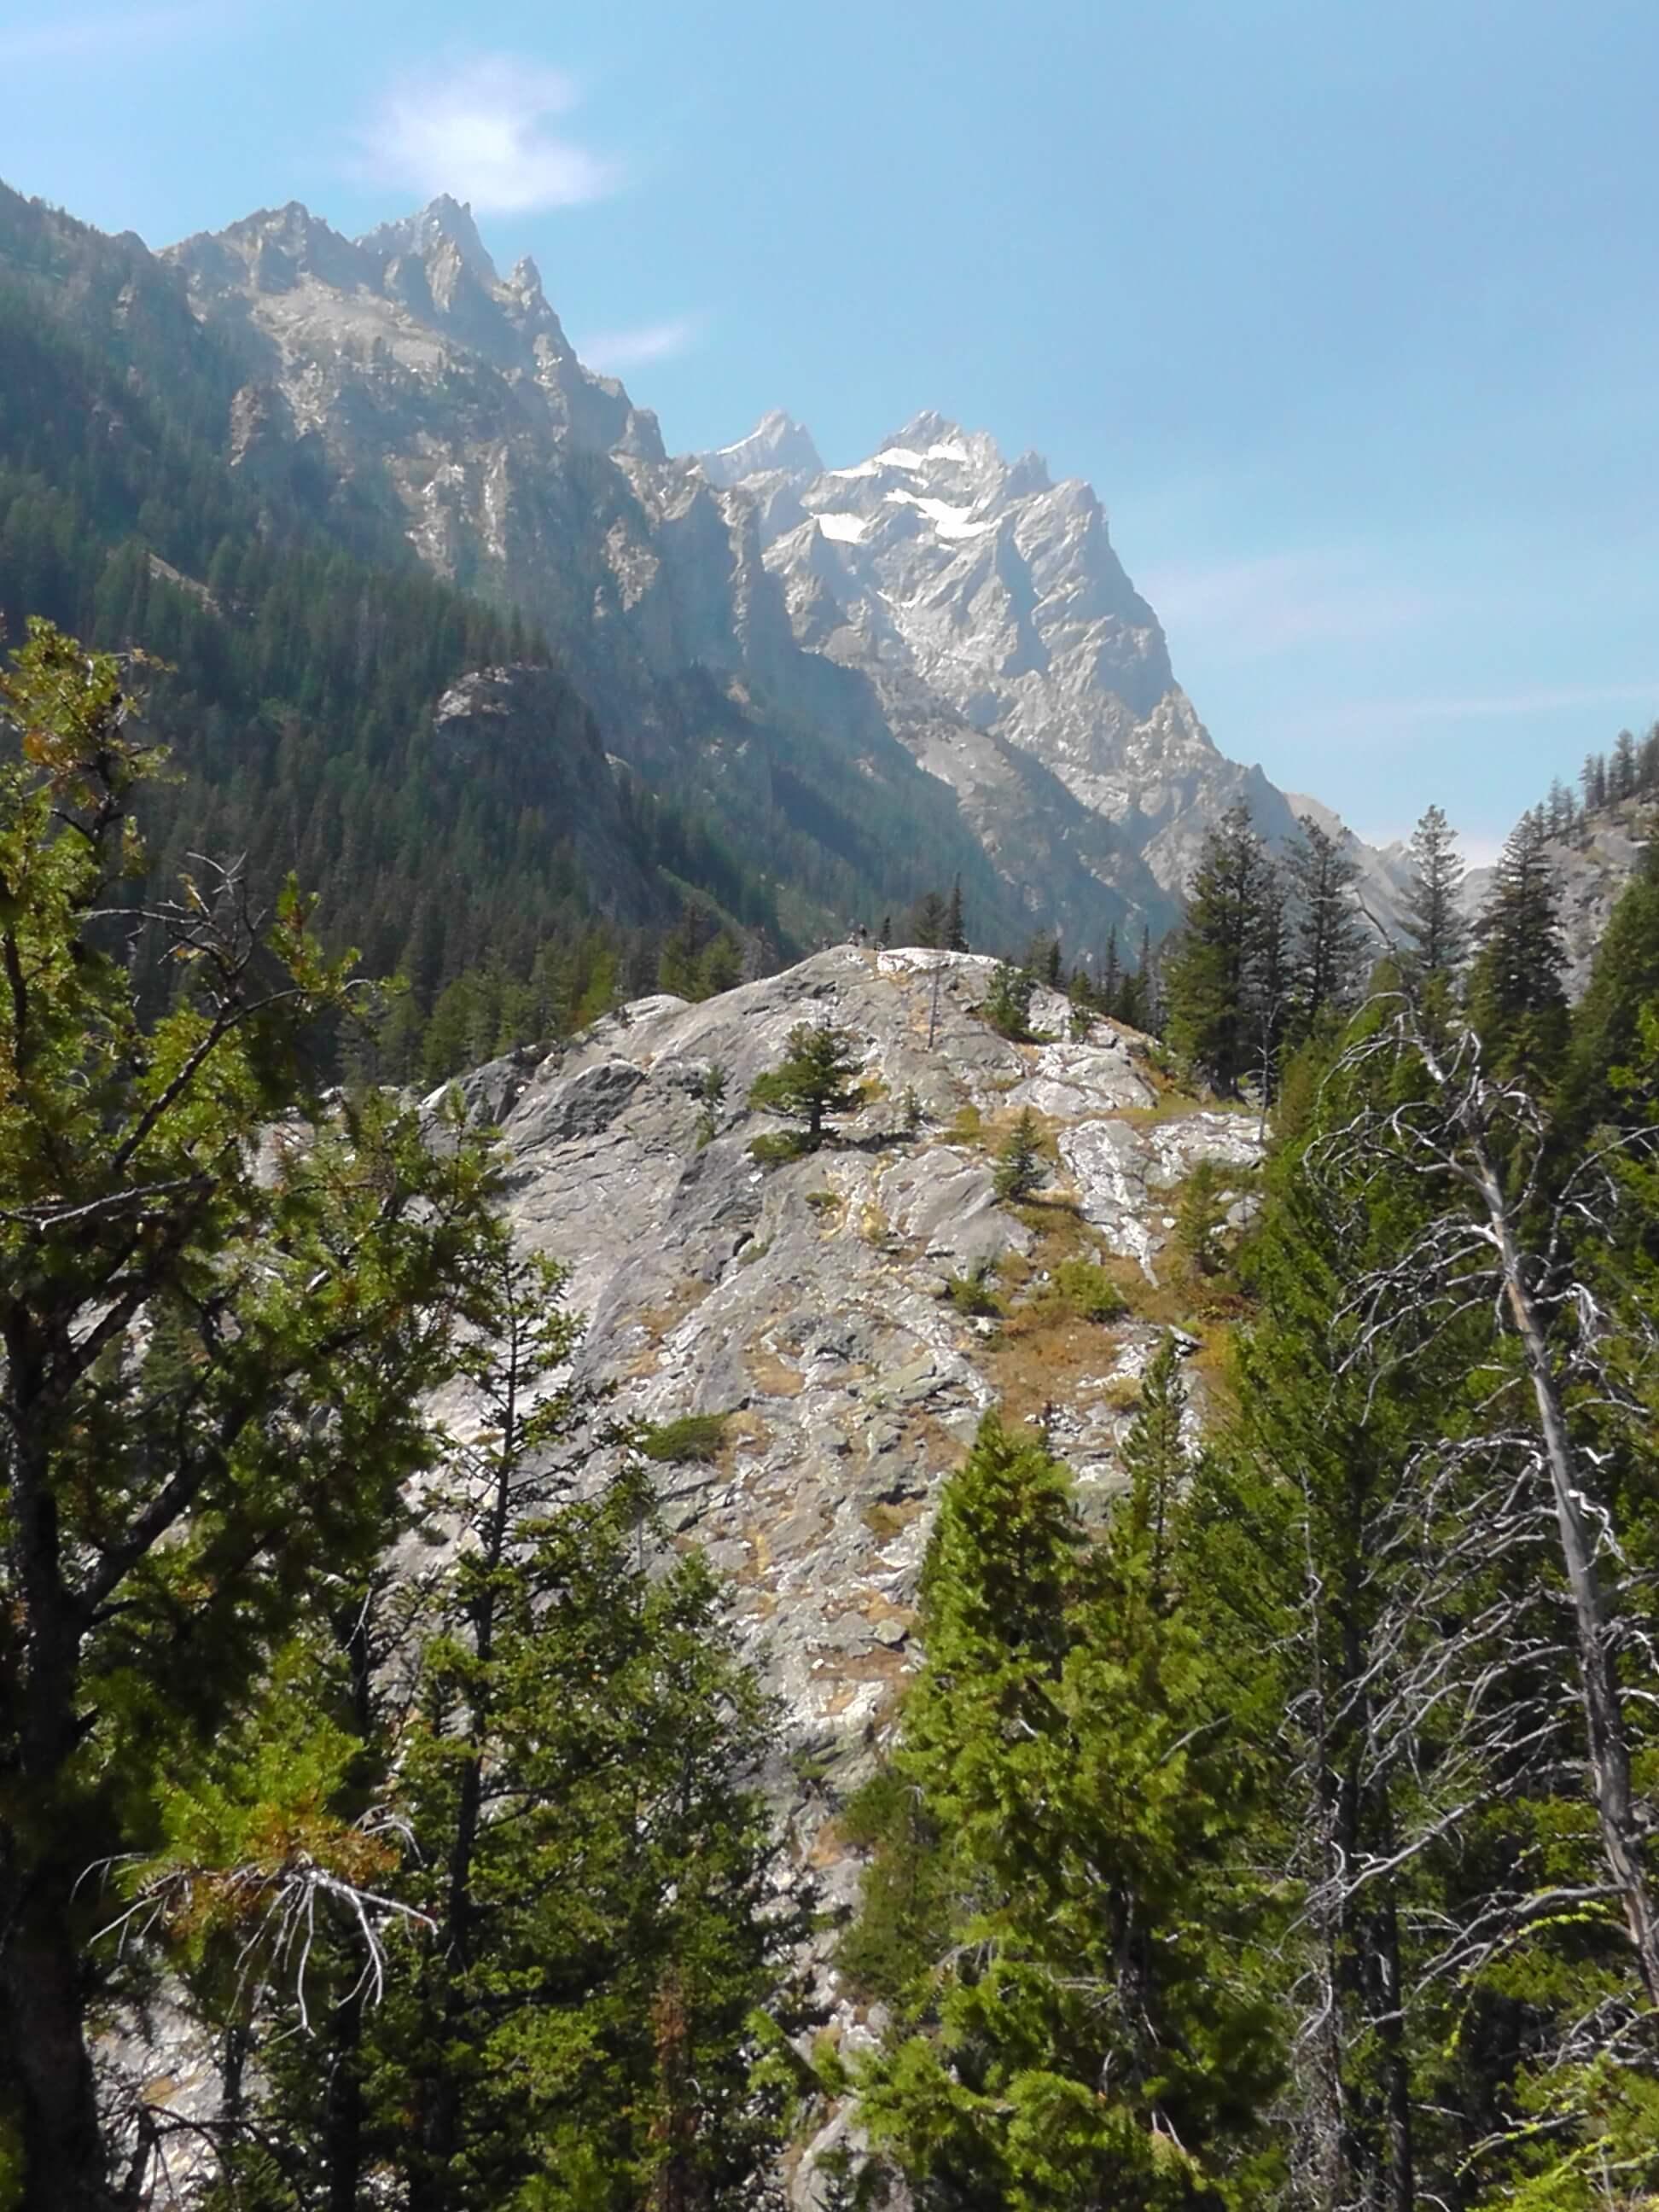 Above Inspiration Point, Grand Teton National Park, Wyoming